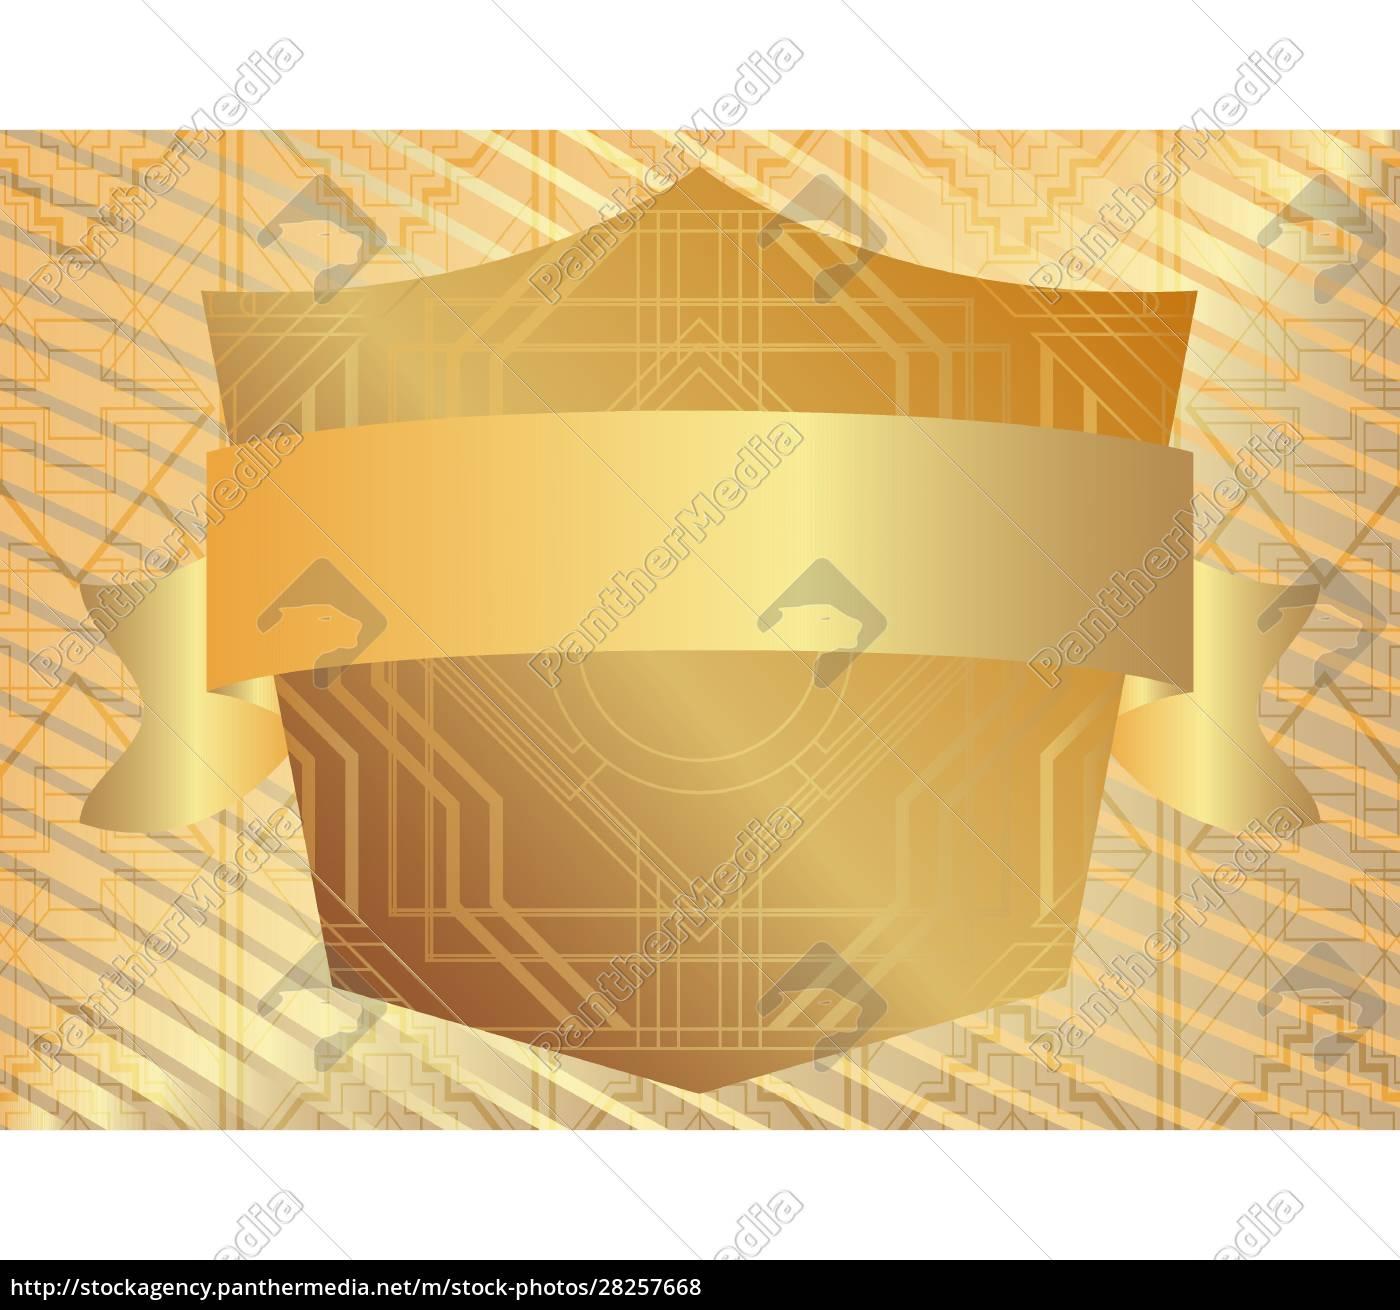 golden, art, deco, luxury, geometric, background - 28257668